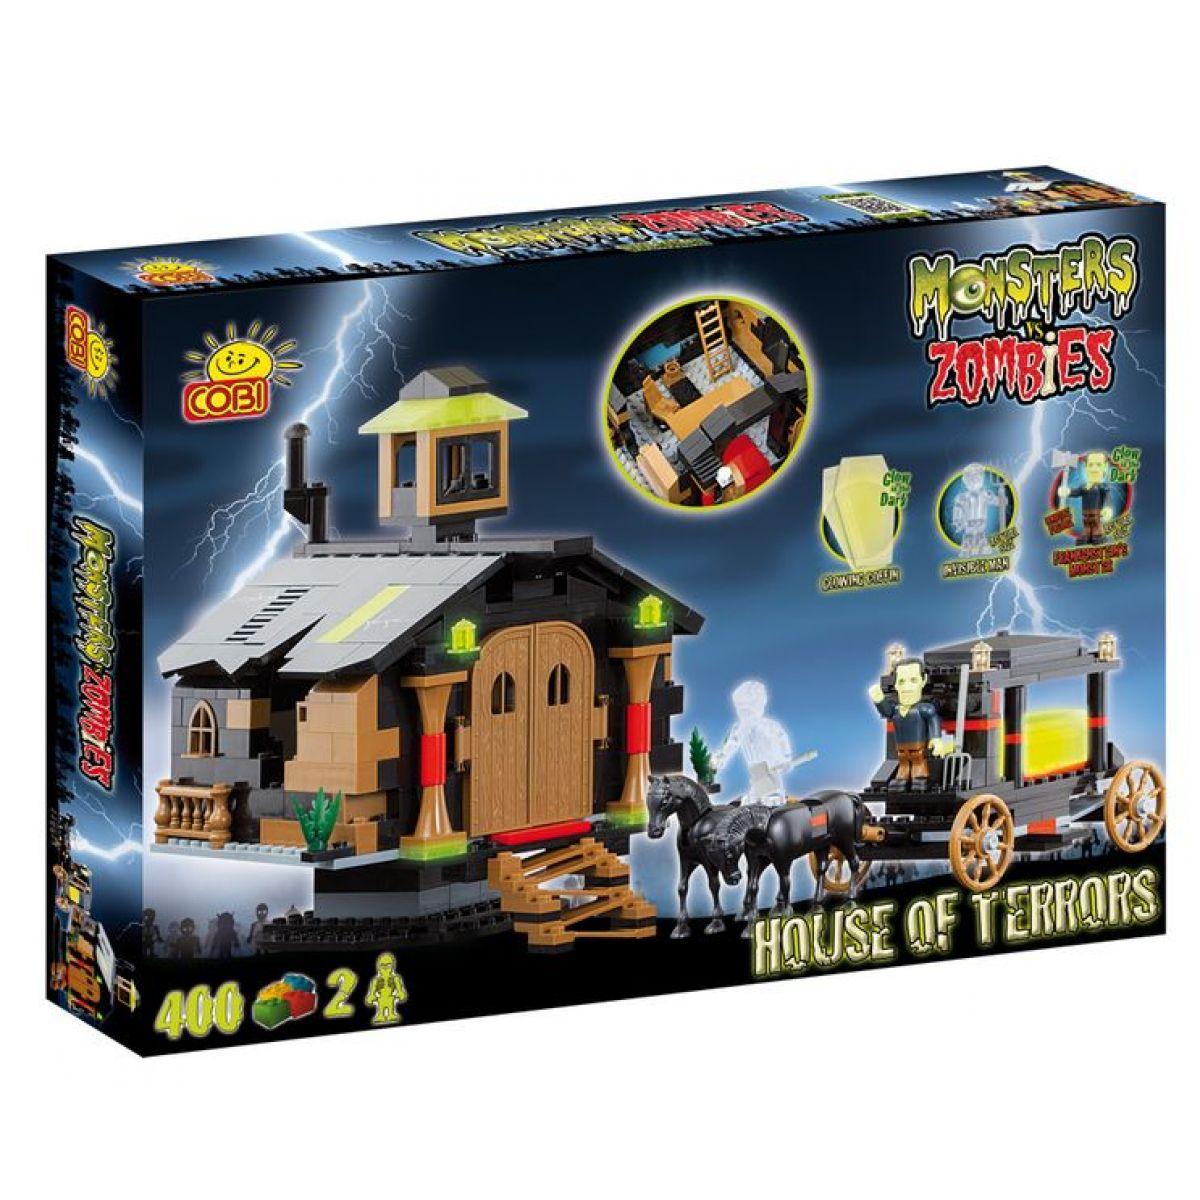 COBI 28400 - Monster vs. Zombies - Kaple hrůzy